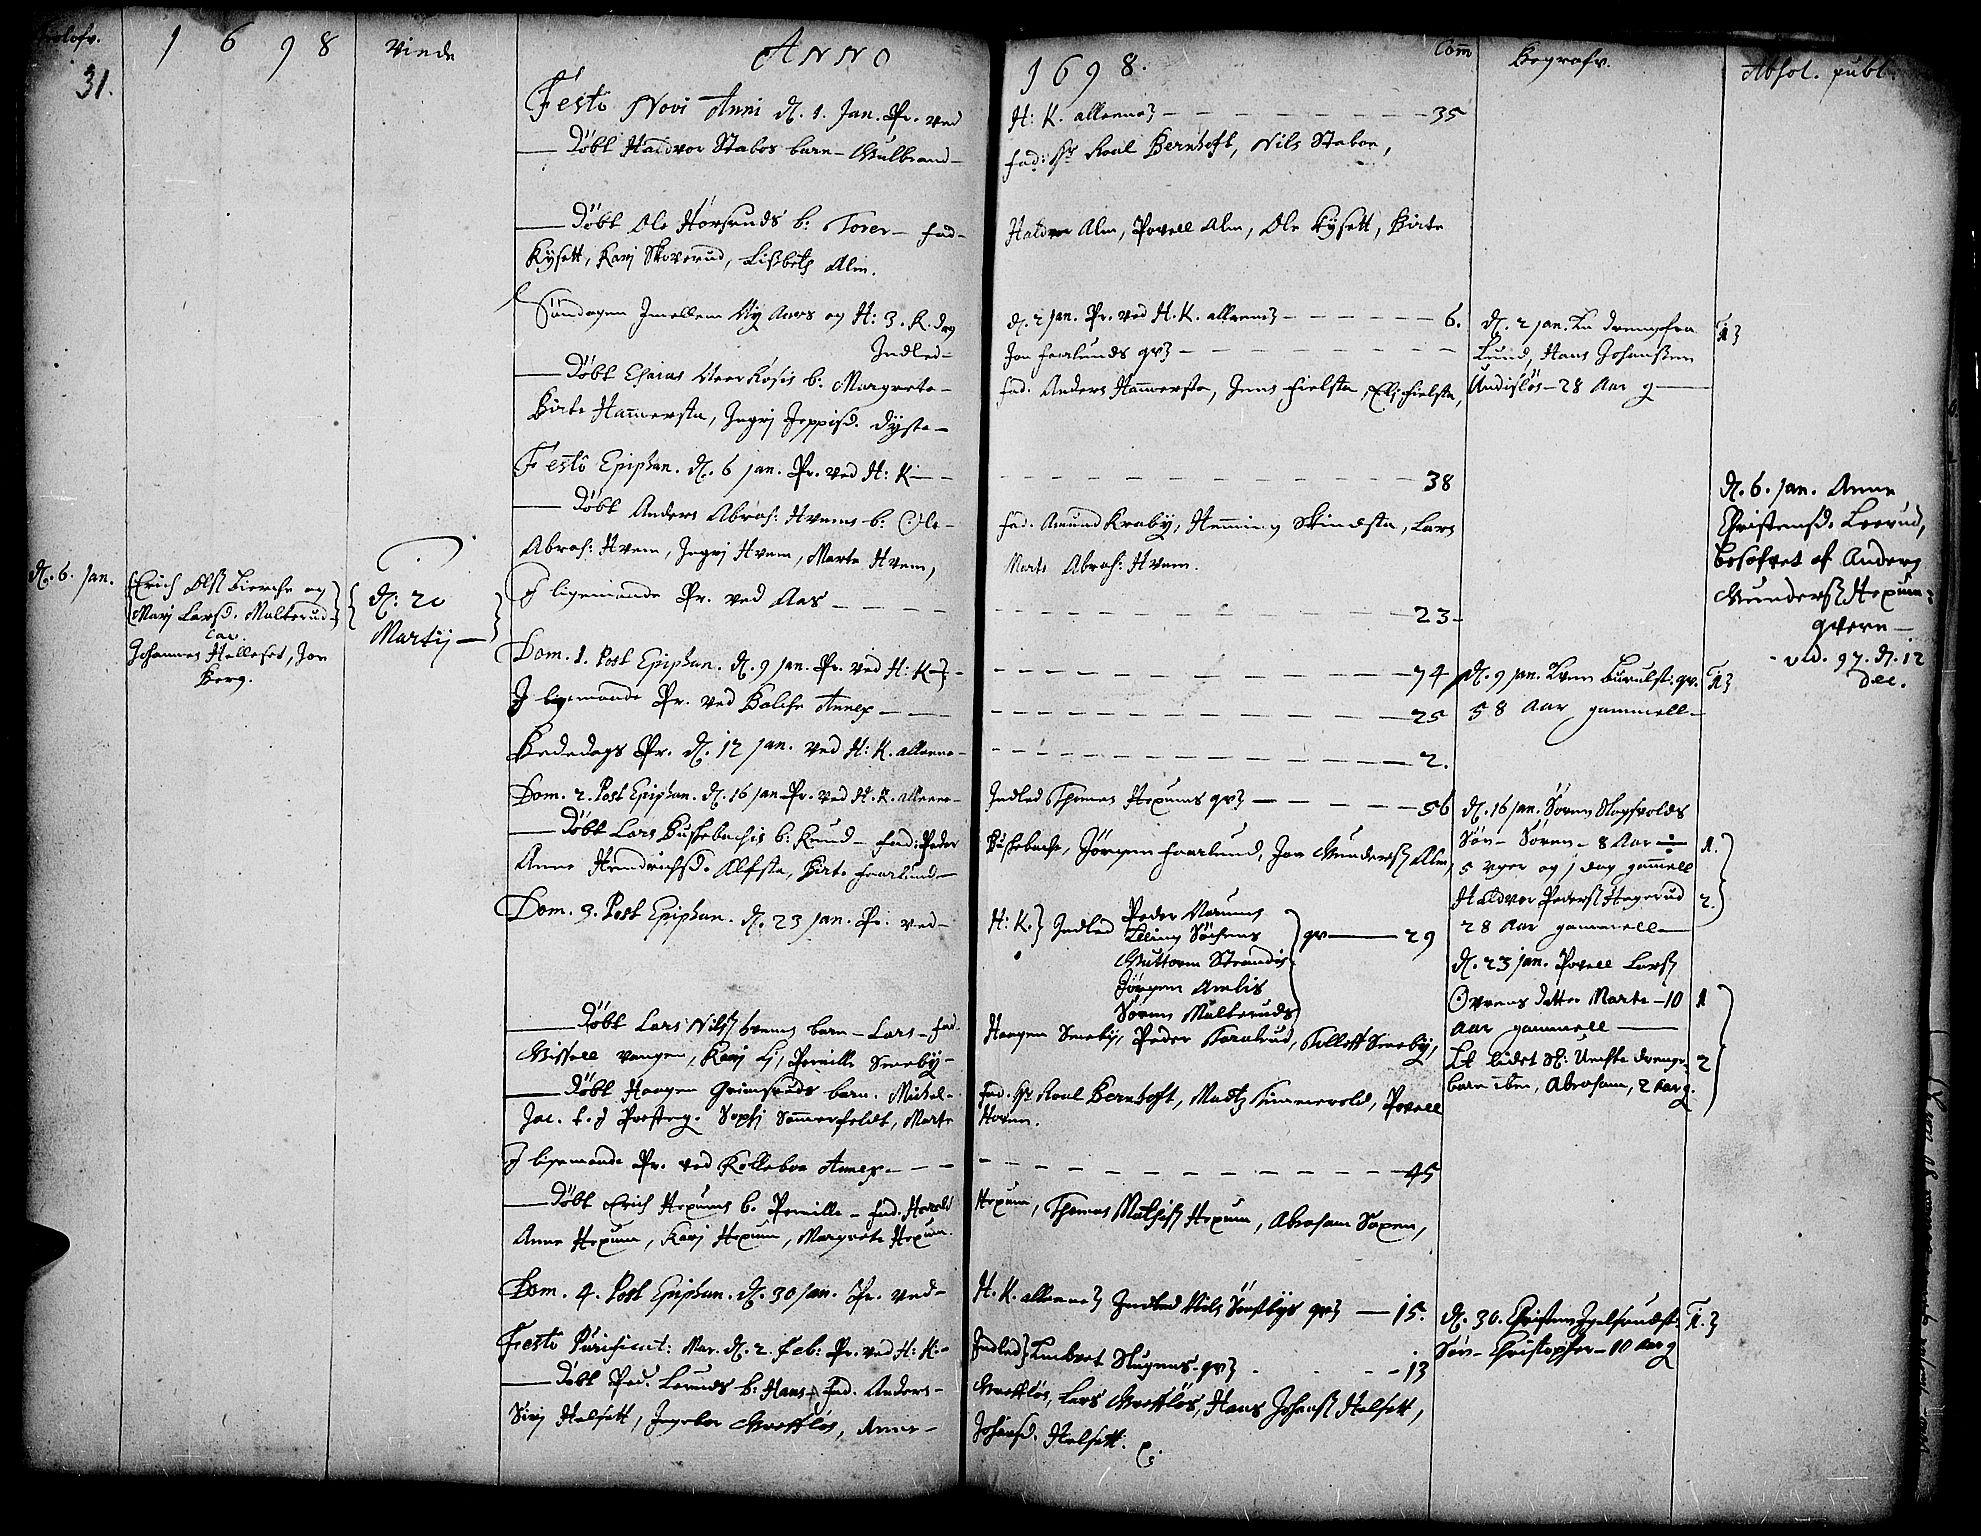 SAH, Toten prestekontor, Ministerialbok nr. 1, 1695-1713, s. 31